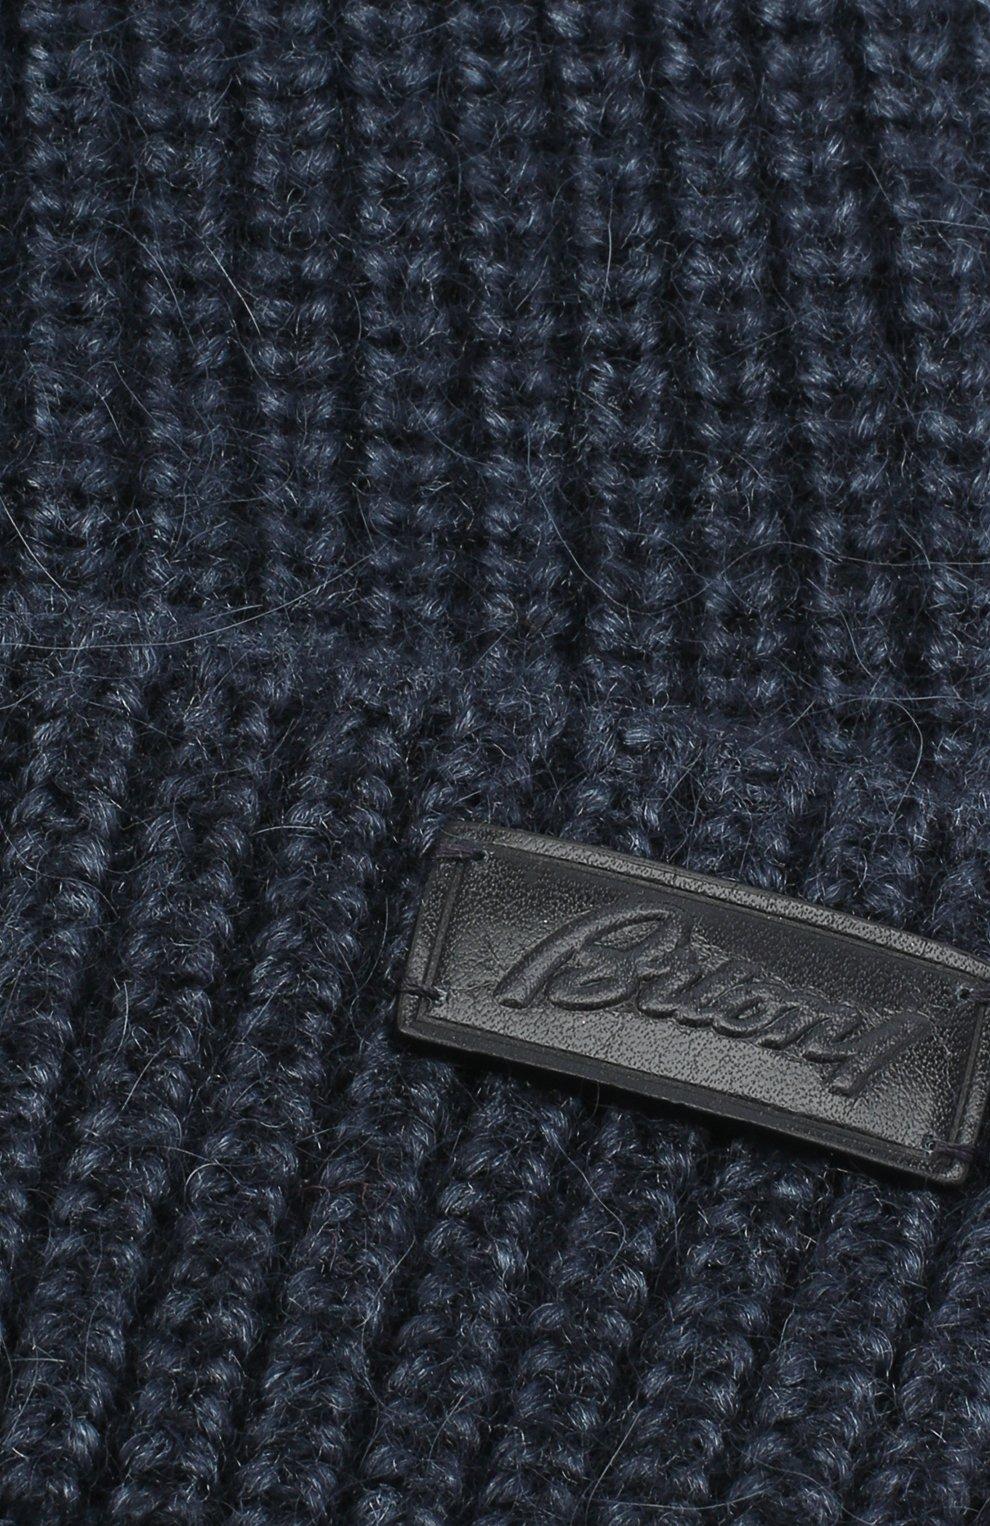 Мужская шапка из шерсти и шелка BRIONI синего цвета, арт. 04M80L/09K32 | Фото 3